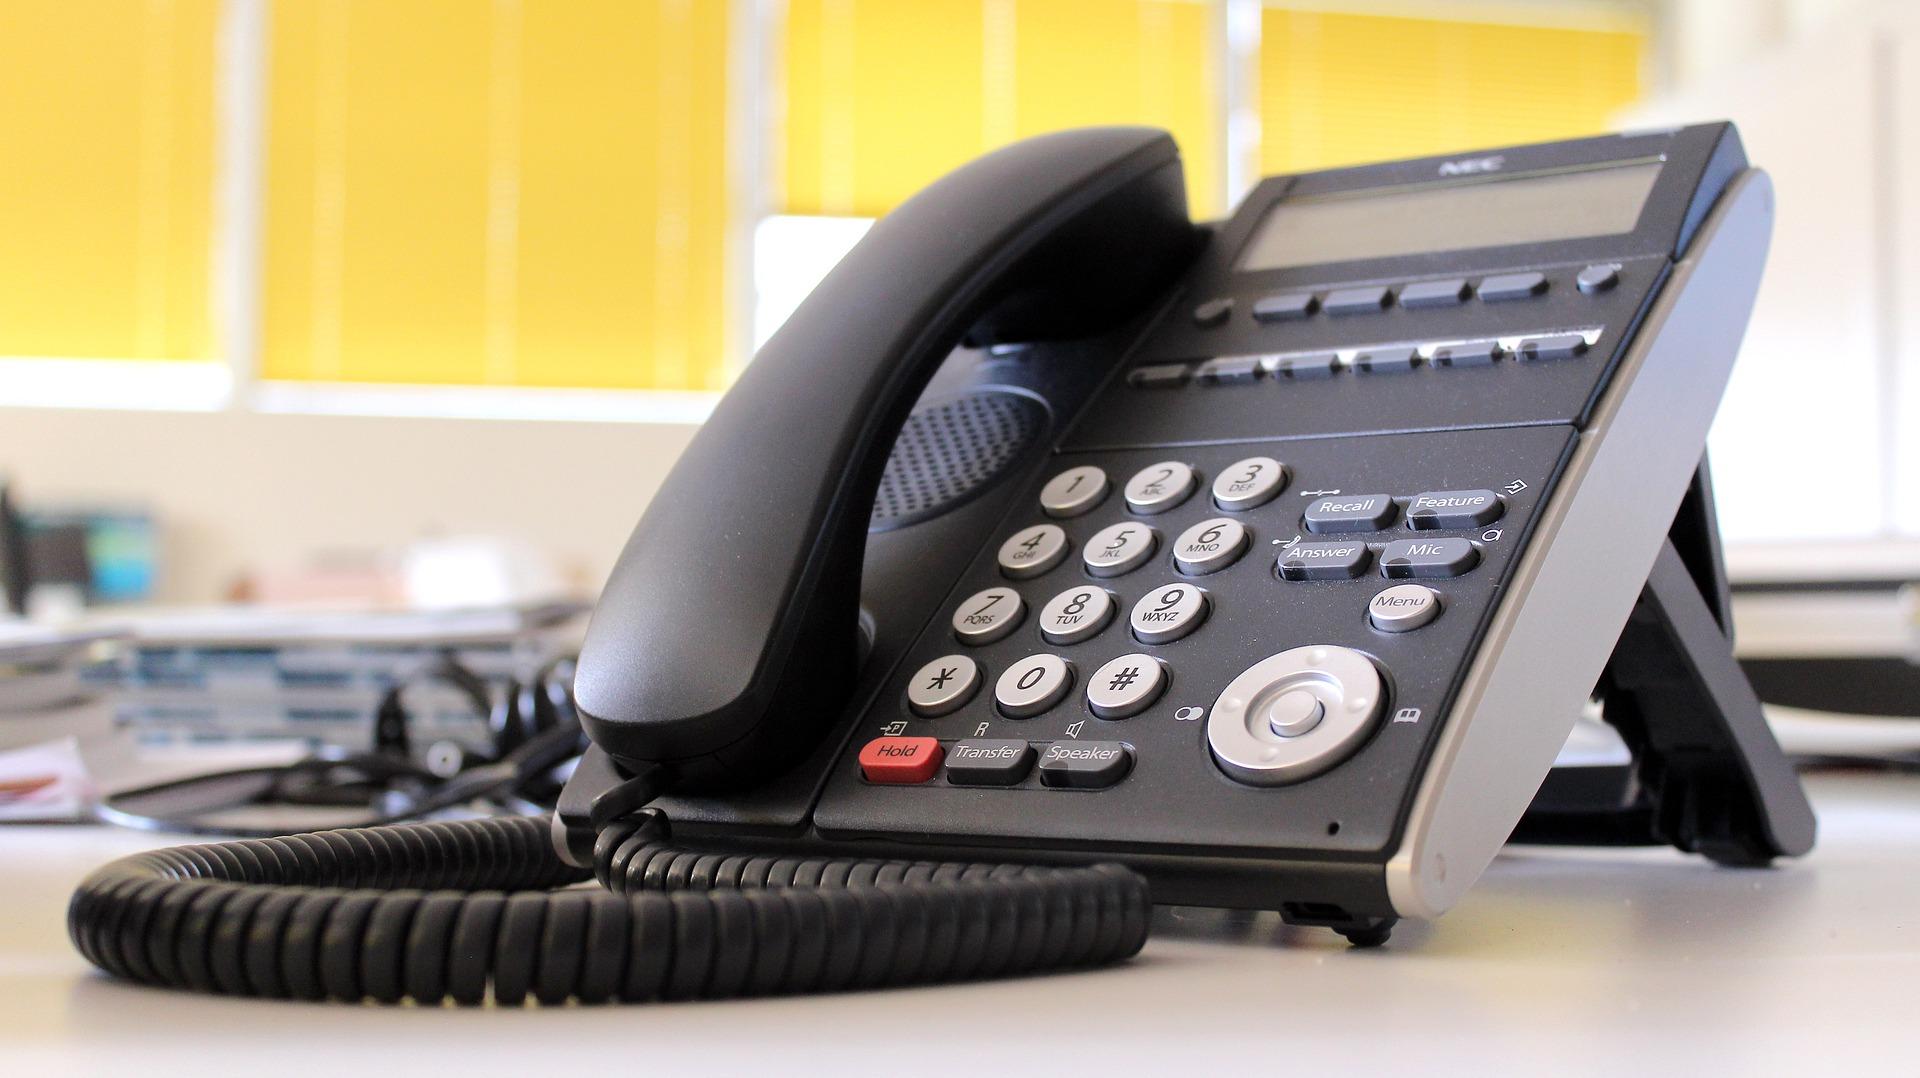 ¿Línea fija o línea móvil? Las ventajas de cada una